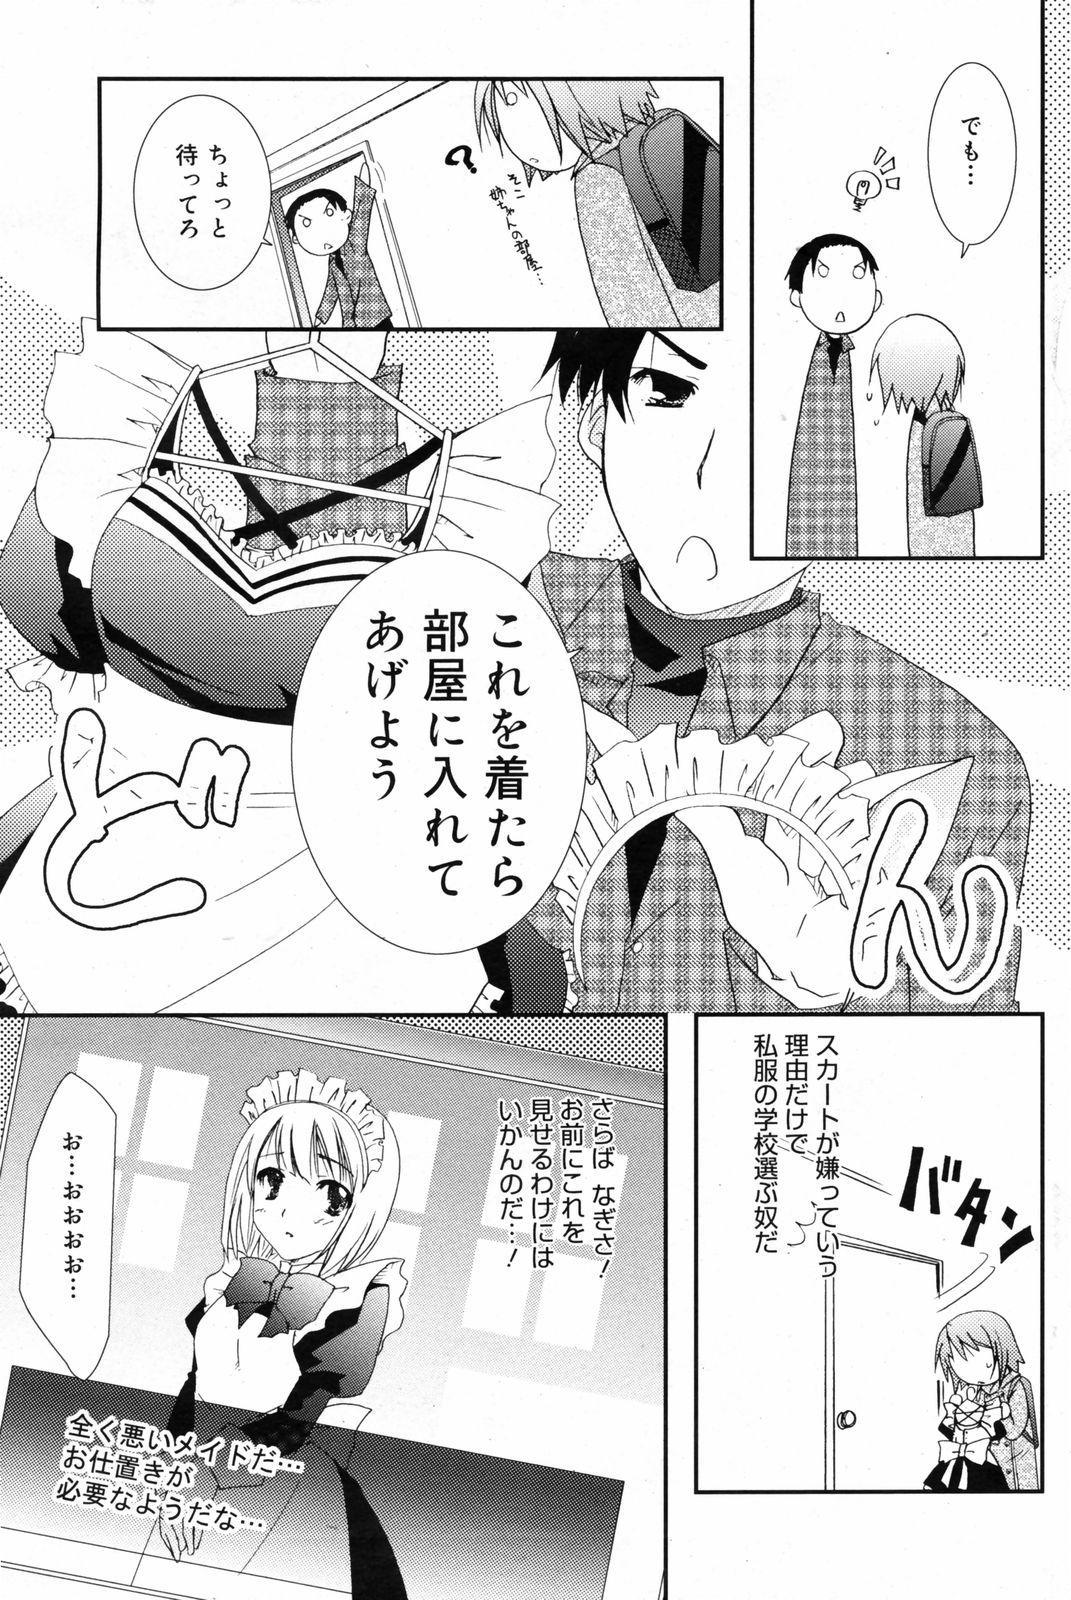 Manga Bangaichi 2008-03 180